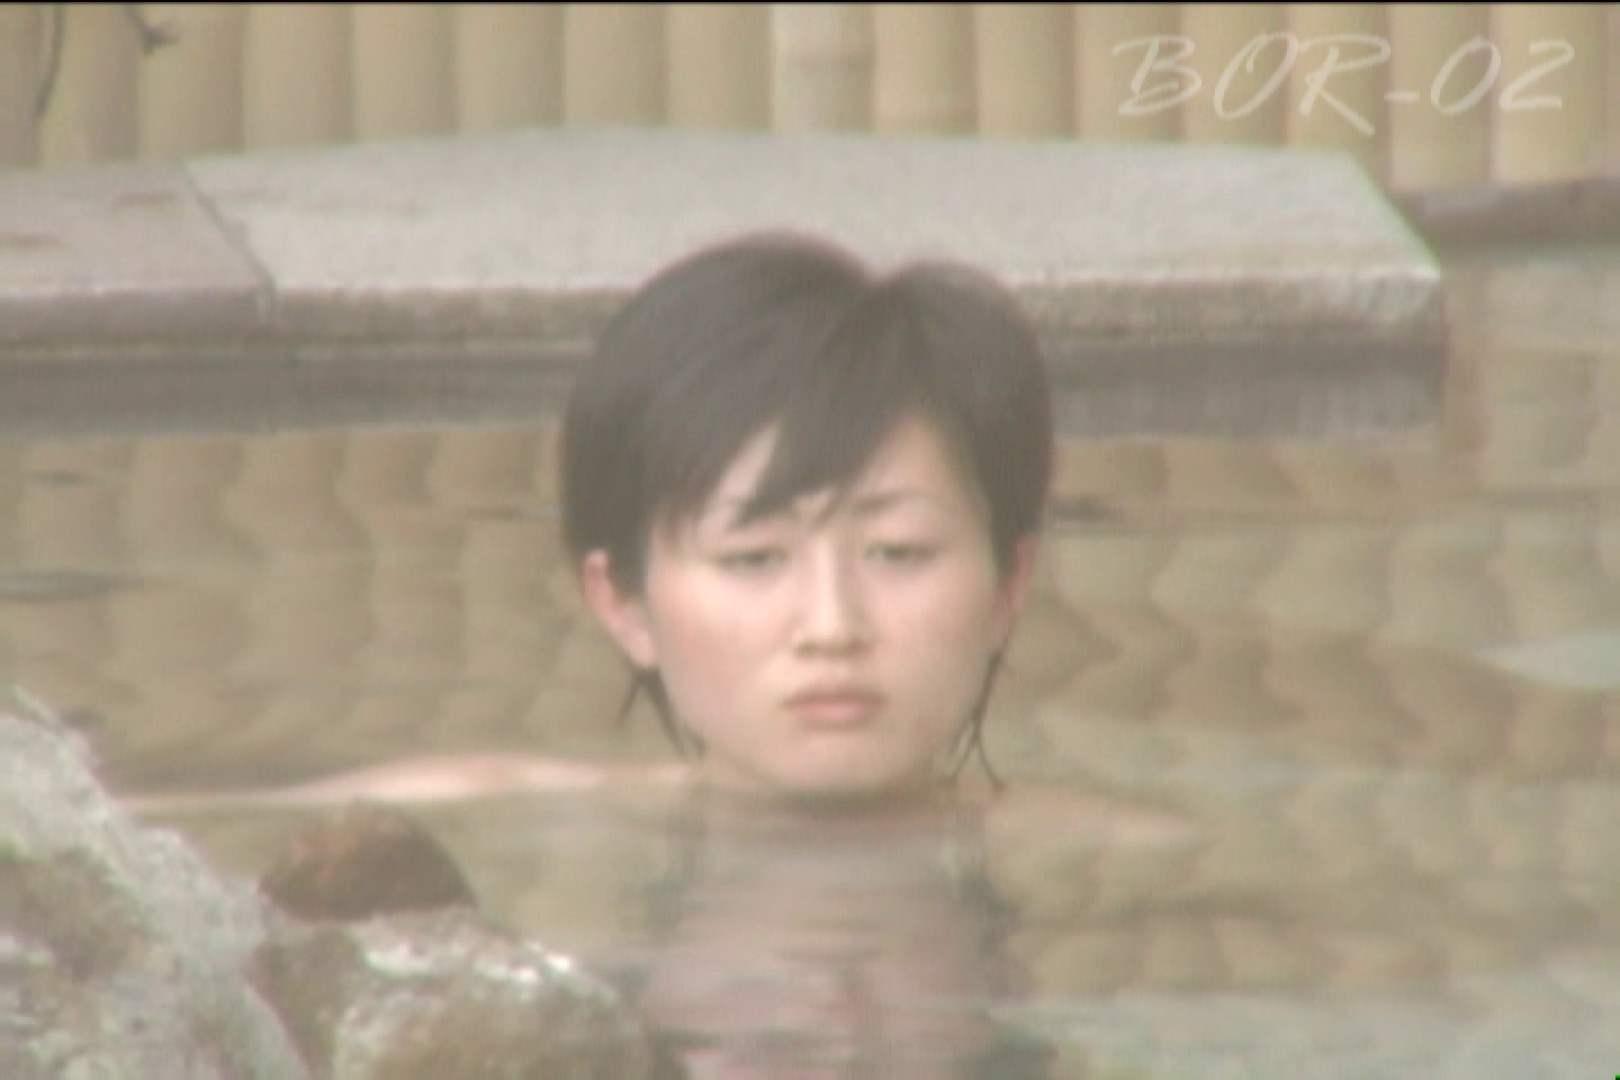 Aquaな露天風呂Vol.480 盗撮シリーズ | 露天風呂編  102PIX 3